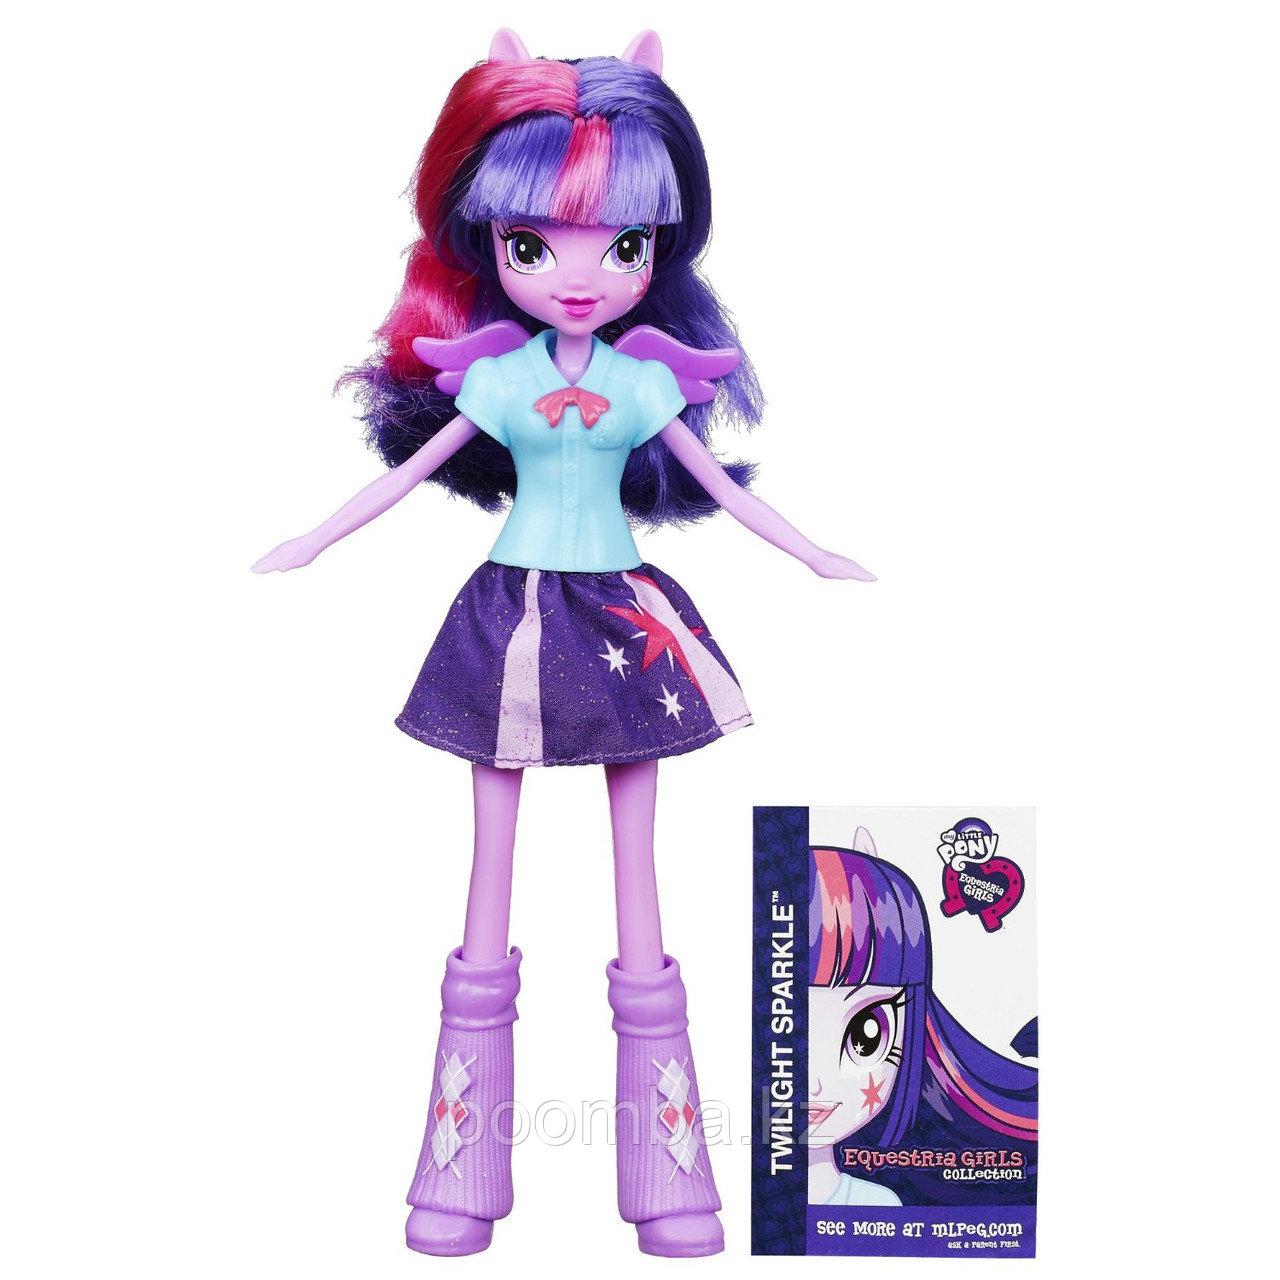 Кукла My Little Pony Equestria Girls - Твайлайт Спаркл в фиолетовых сапожках